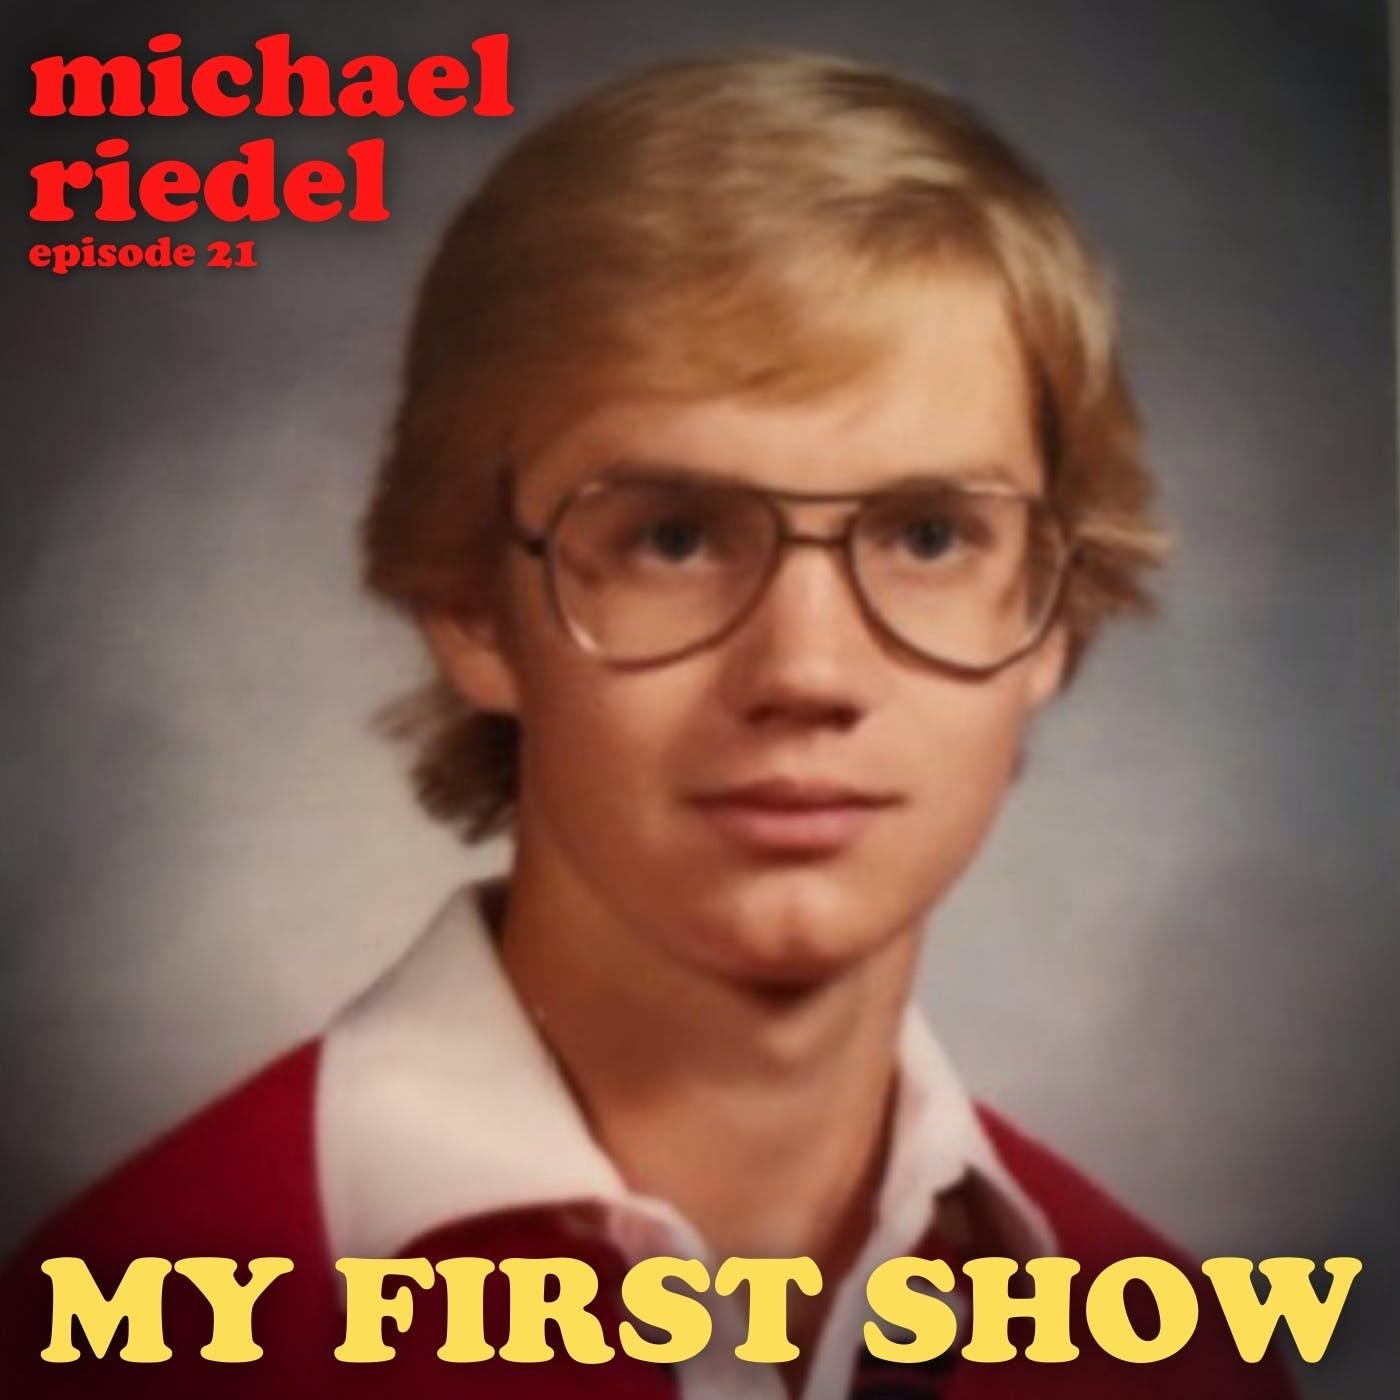 S1/Ep21: Michael Riedel